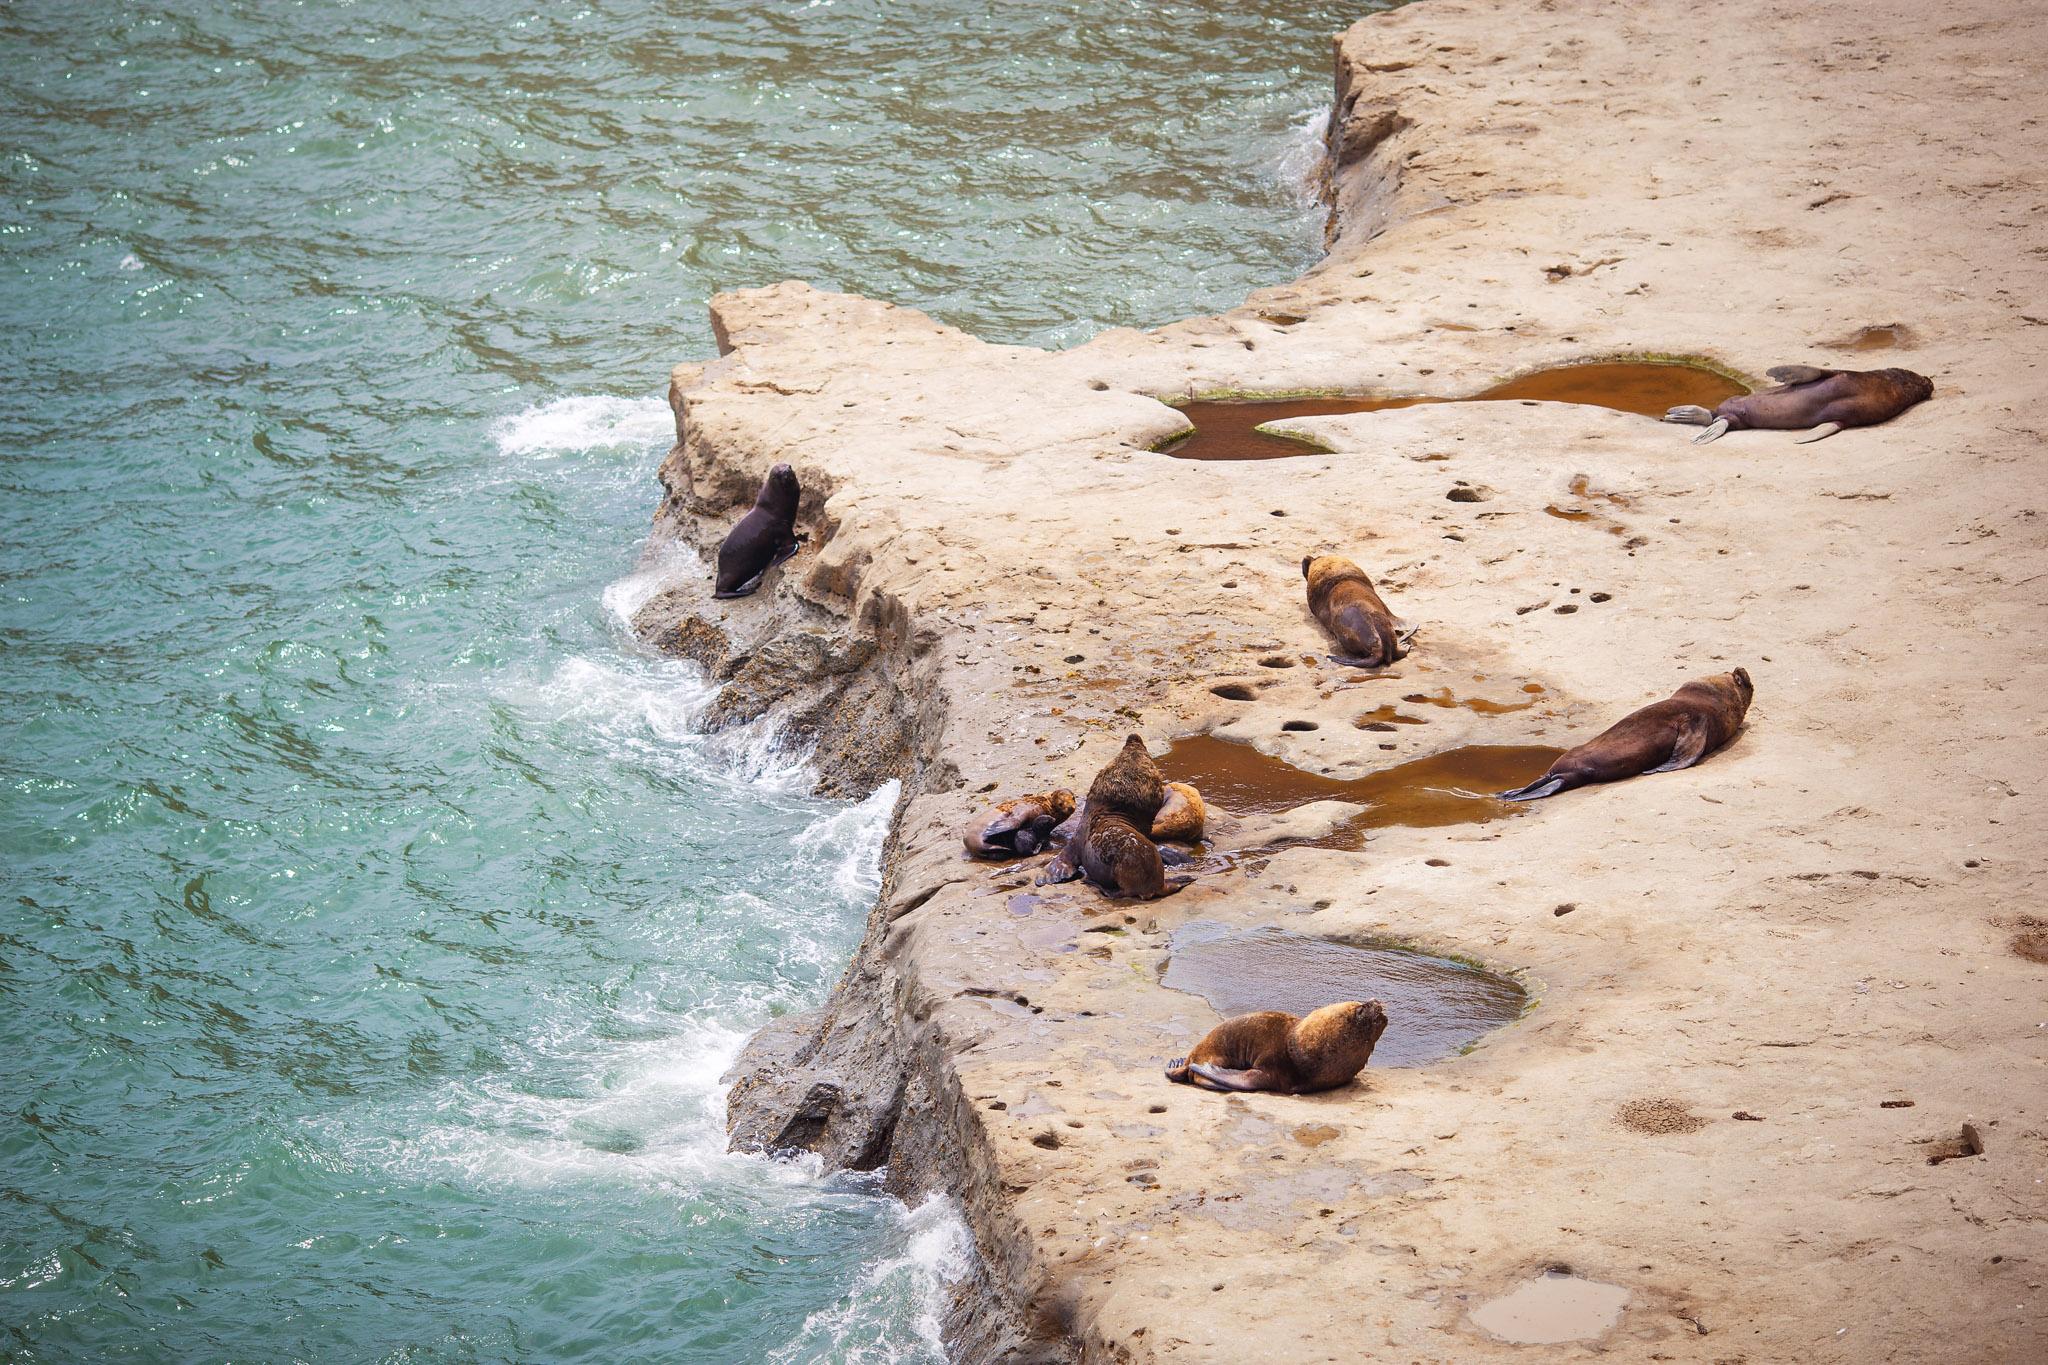 wedding-travellers-argentina-peninsula-valdes-sea-lion-shore-coast-cliff